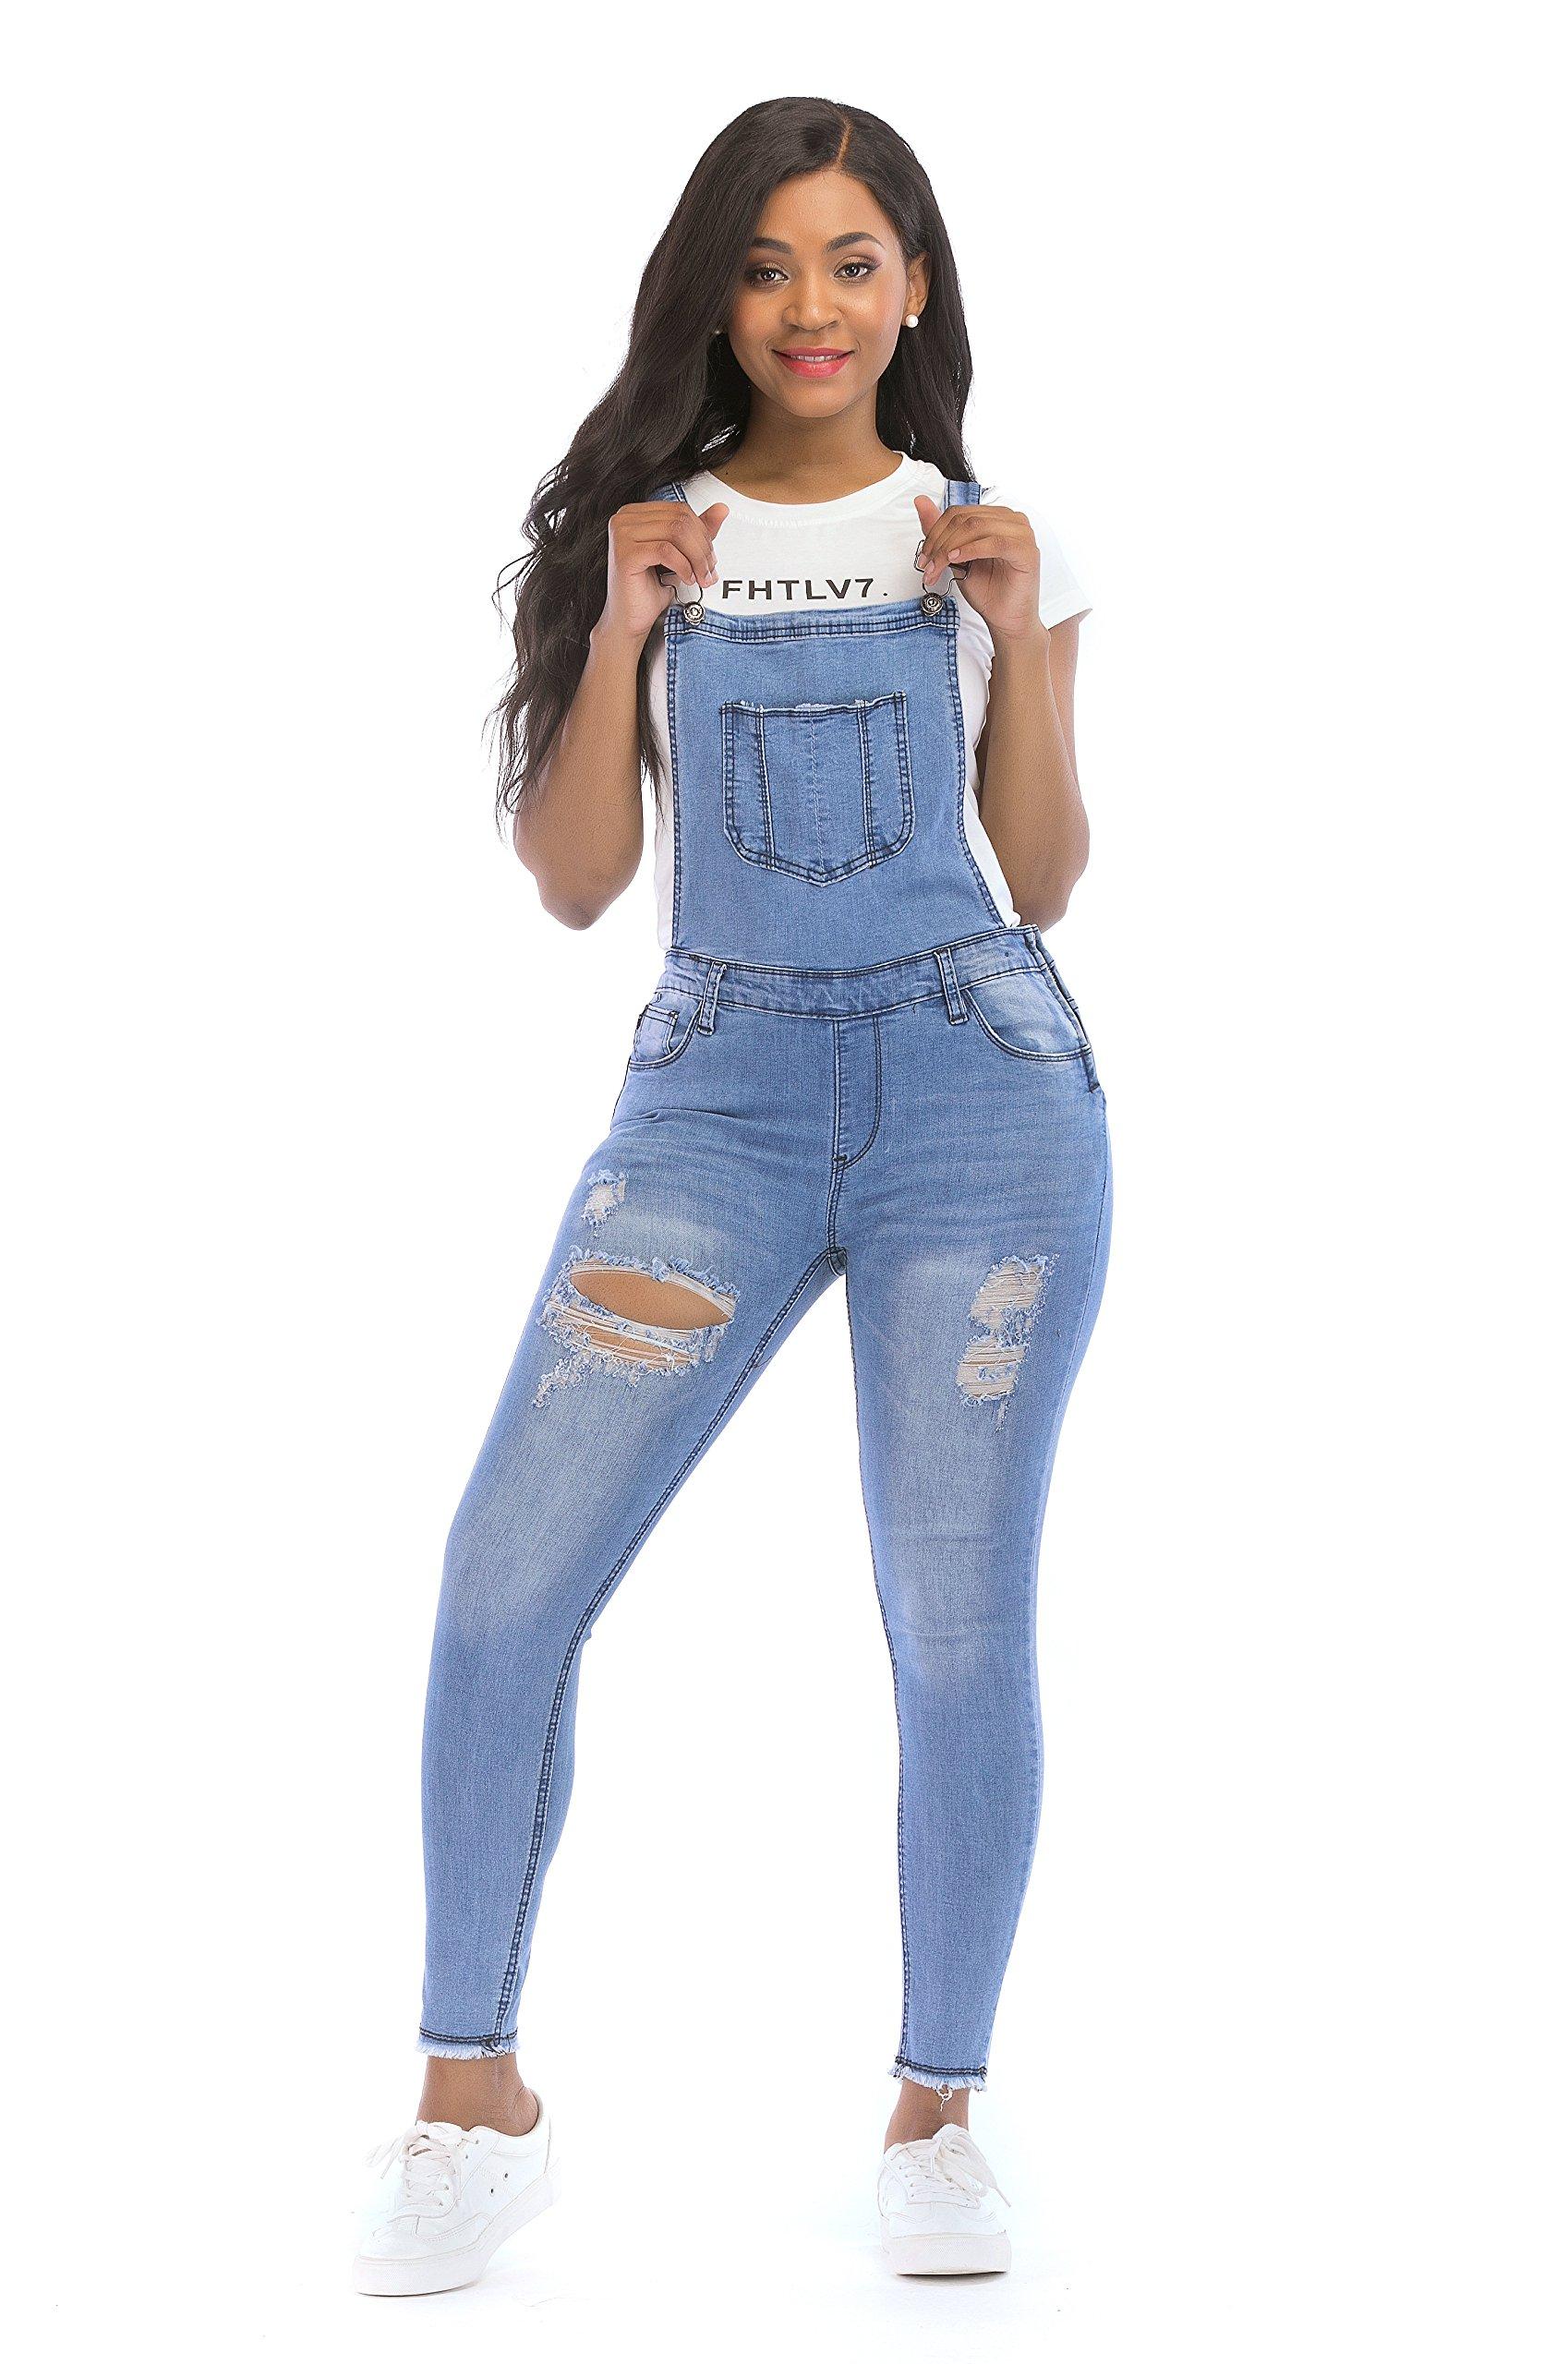 POPTIME Women's Jeans Jumpsuit Long Denim Ripped Distressed Trousers Overalls Strap Jeans Jumpsuits (X-Large, Blue)